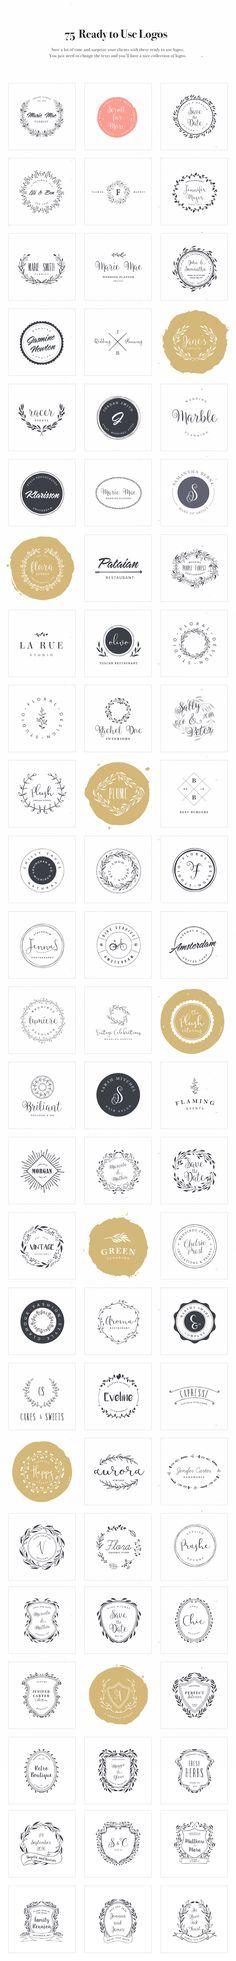 Logo Design Kit by VladCristea on @creativemarket